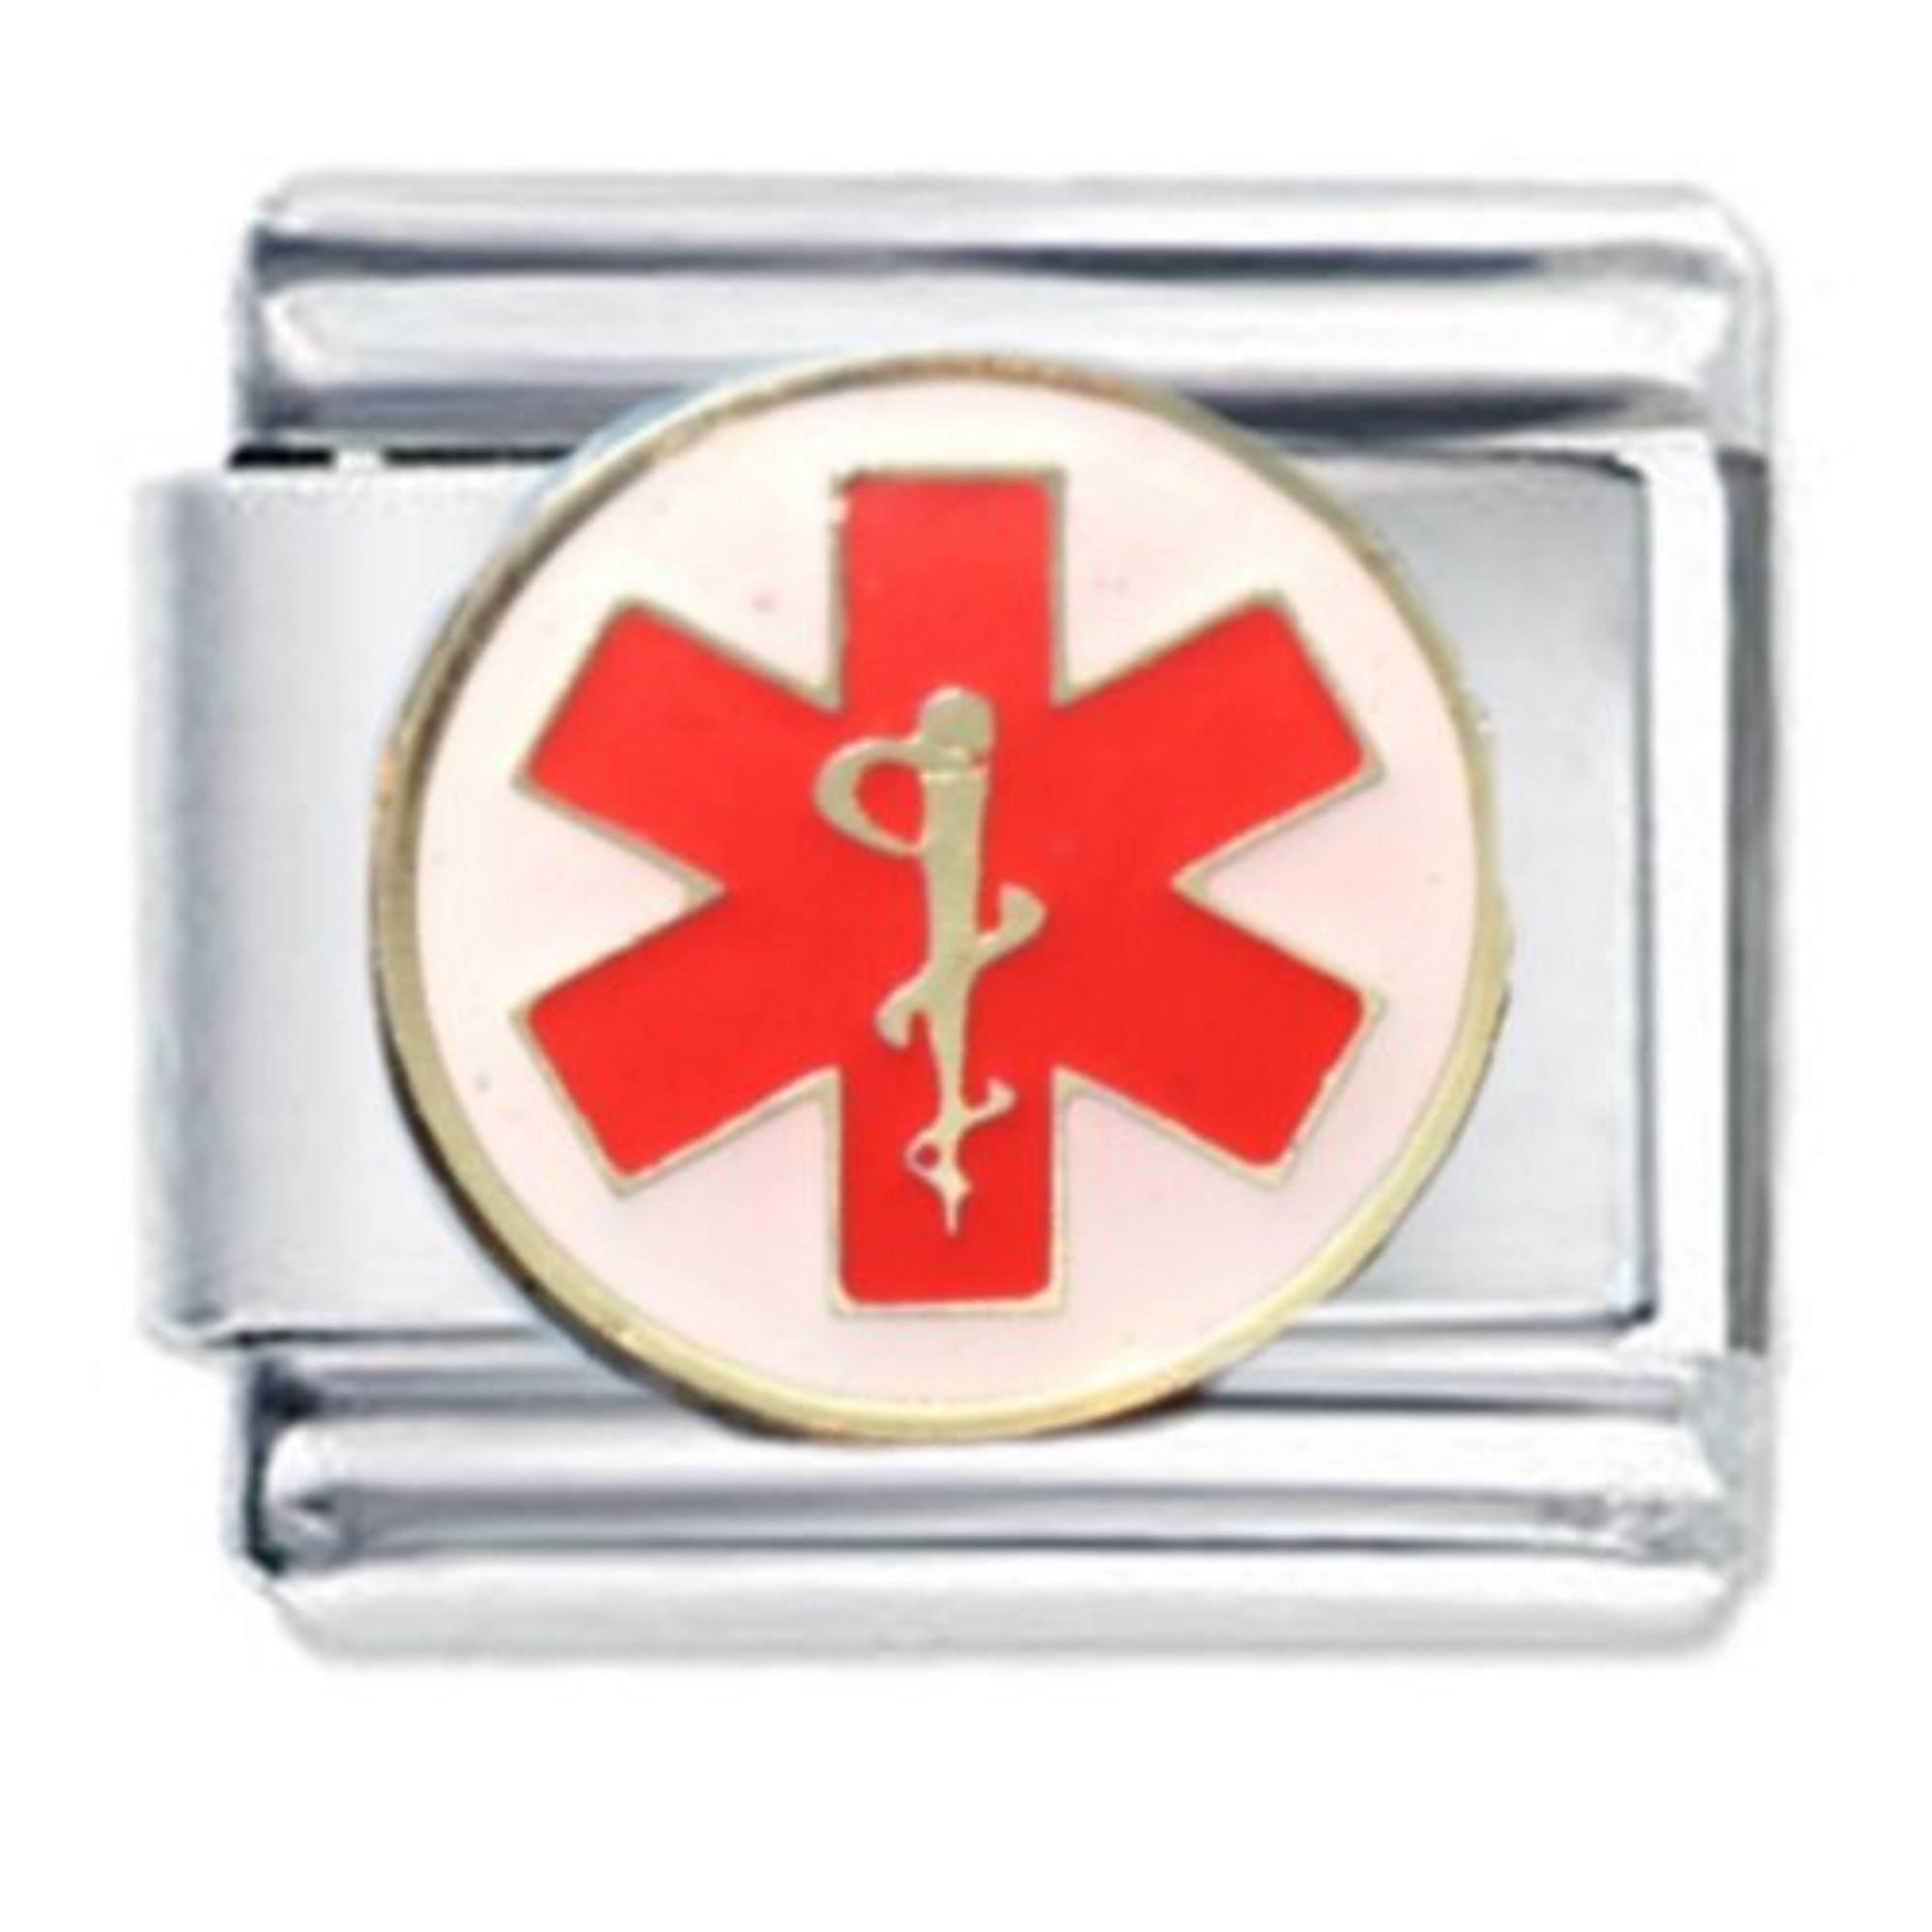 JSC Jewellery Caduceus Medical Symbol Enamel Charm by Daisy Charm® fits Nomination Classic Bracelets